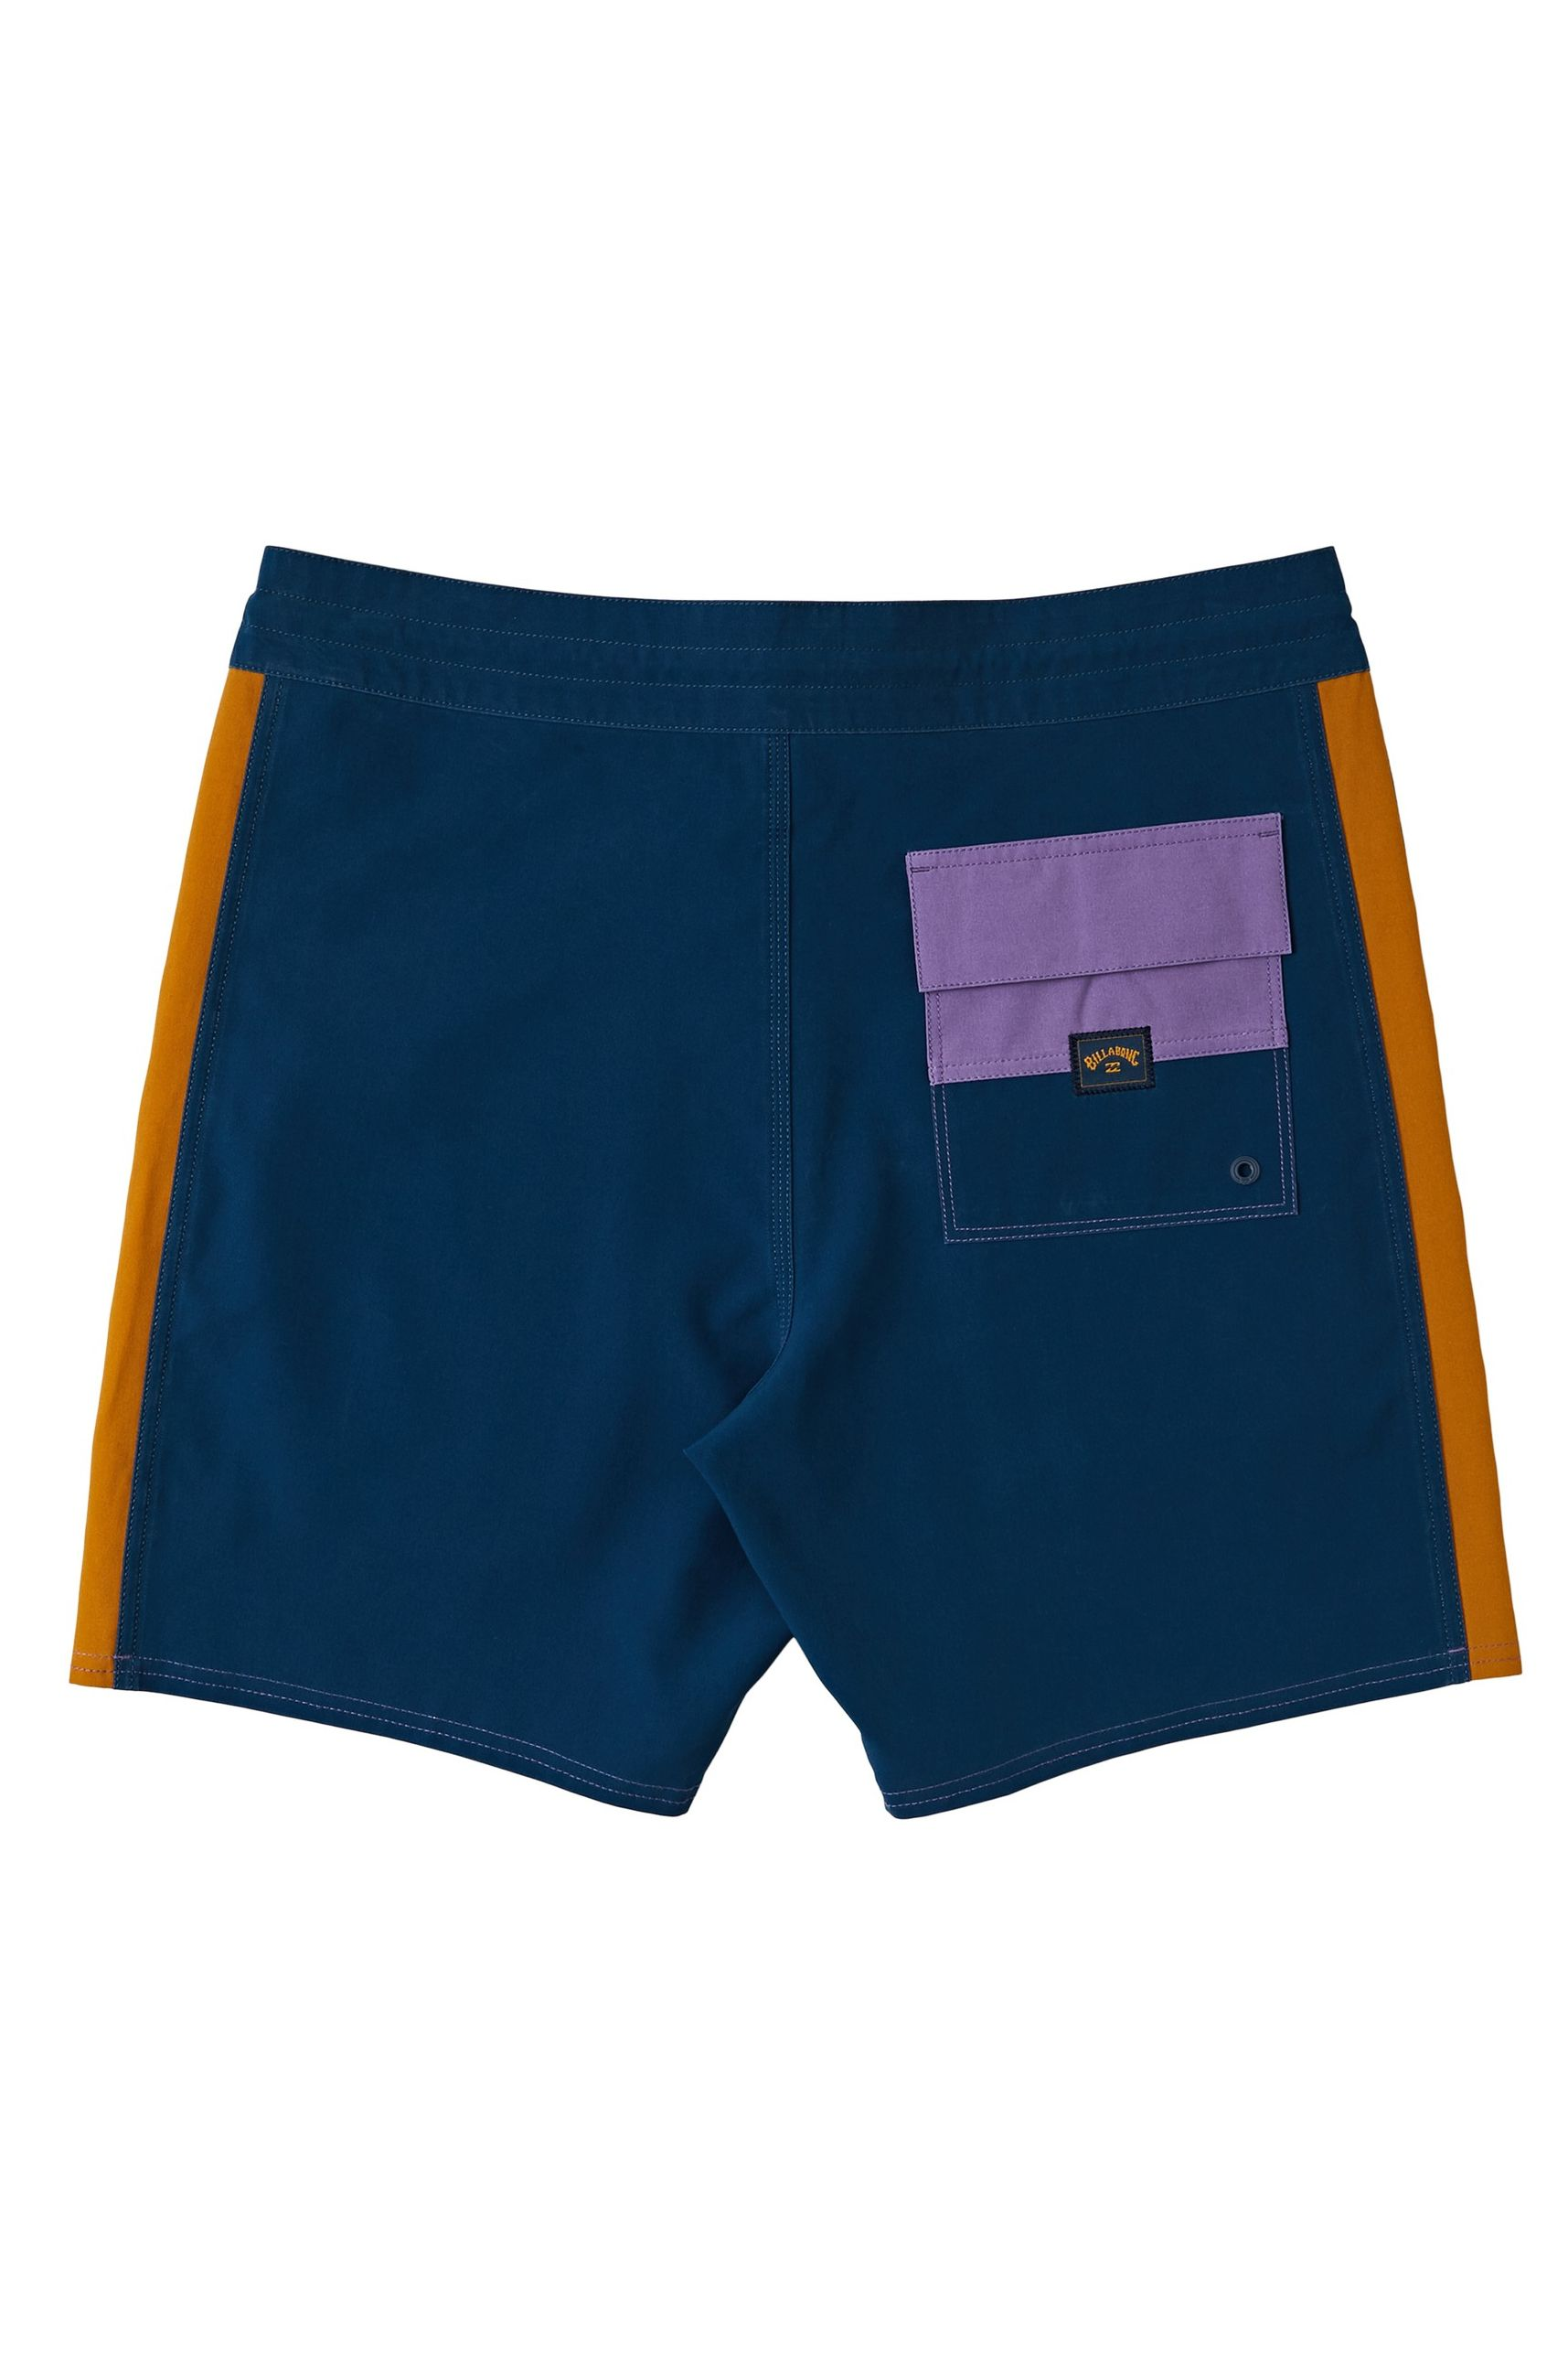 Boardshorts Billabong DBAH LT Lilac